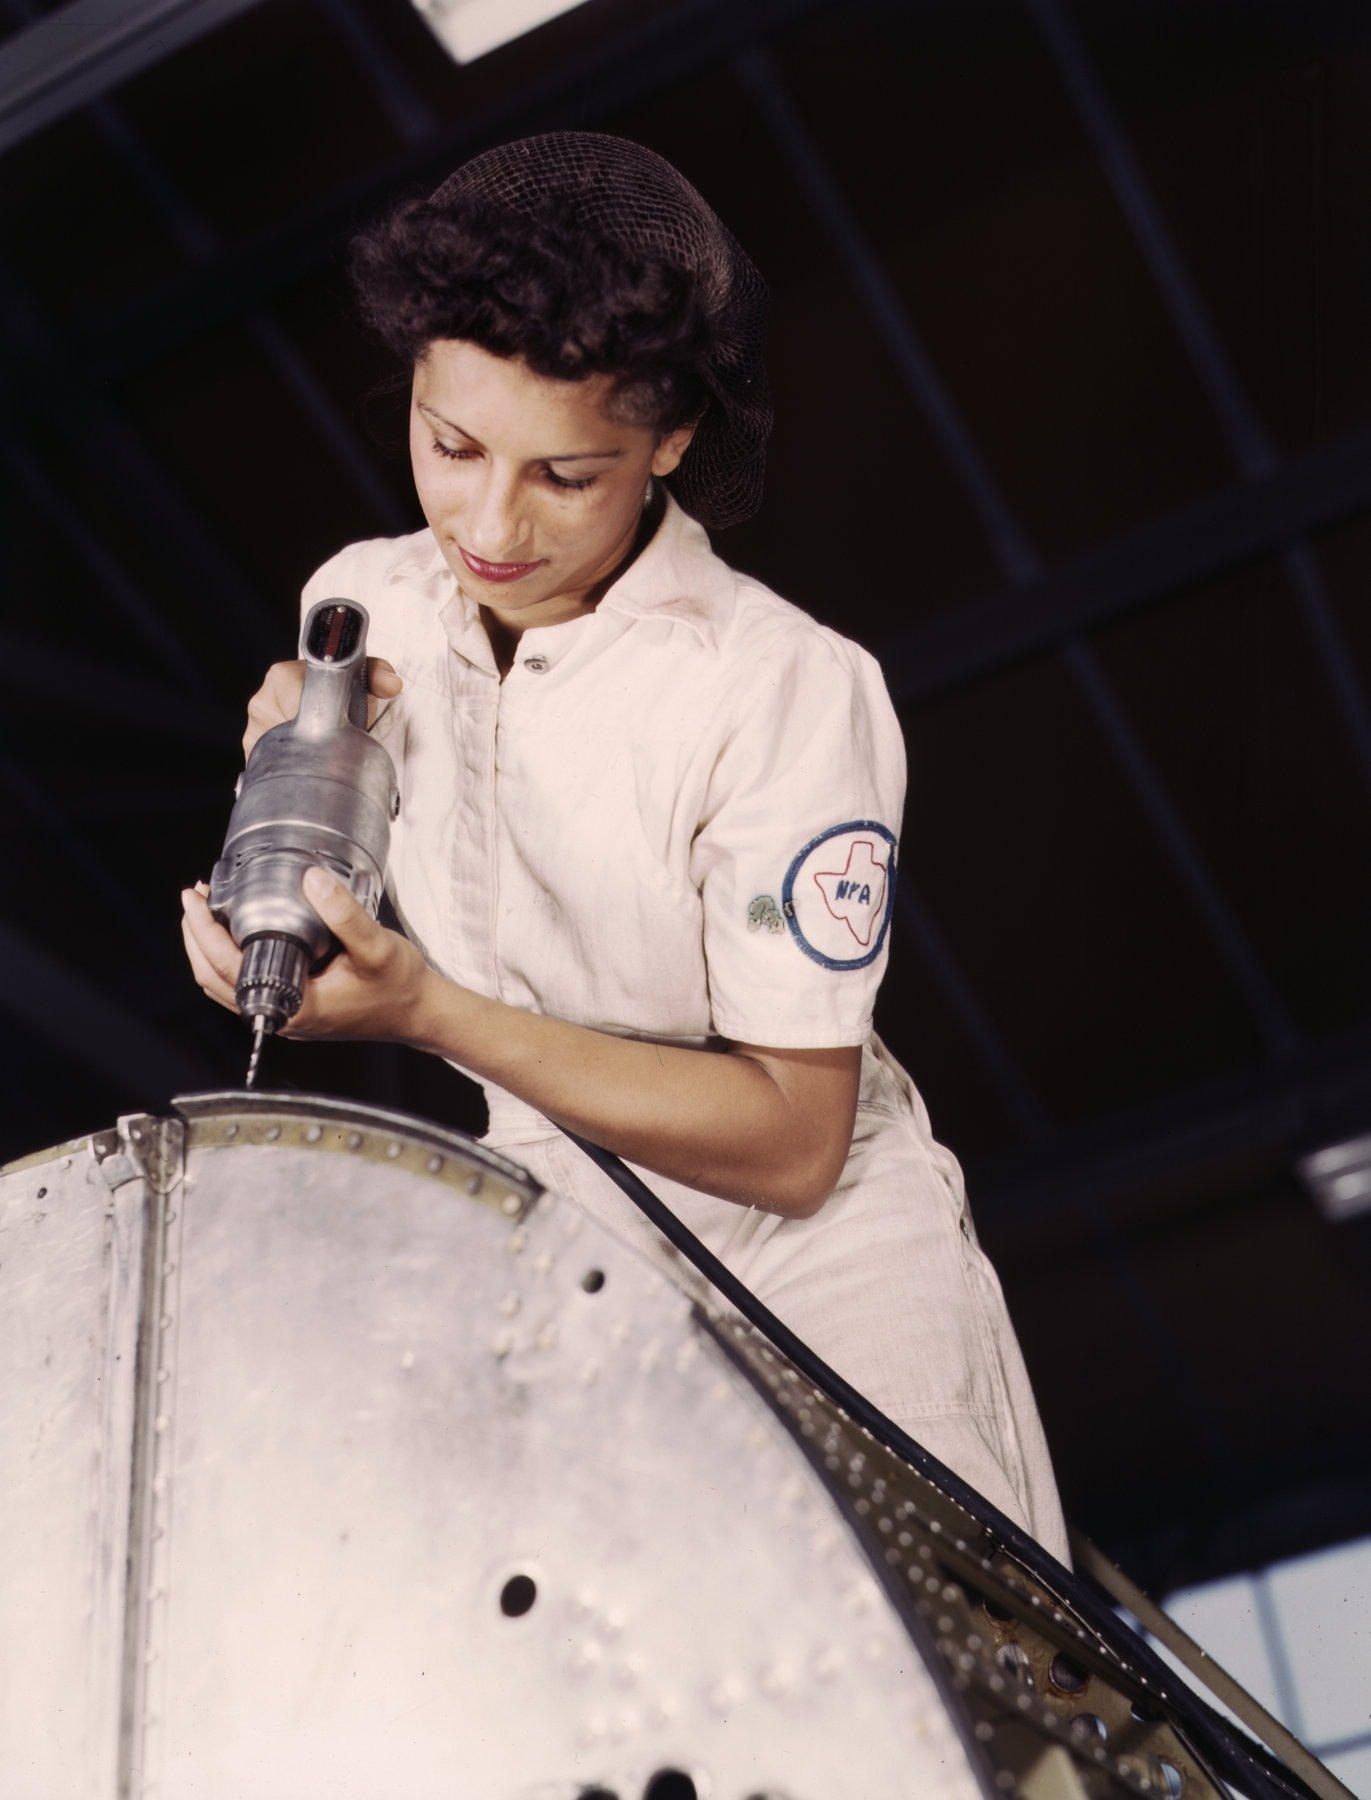 Texas WWII mechanic-in-training